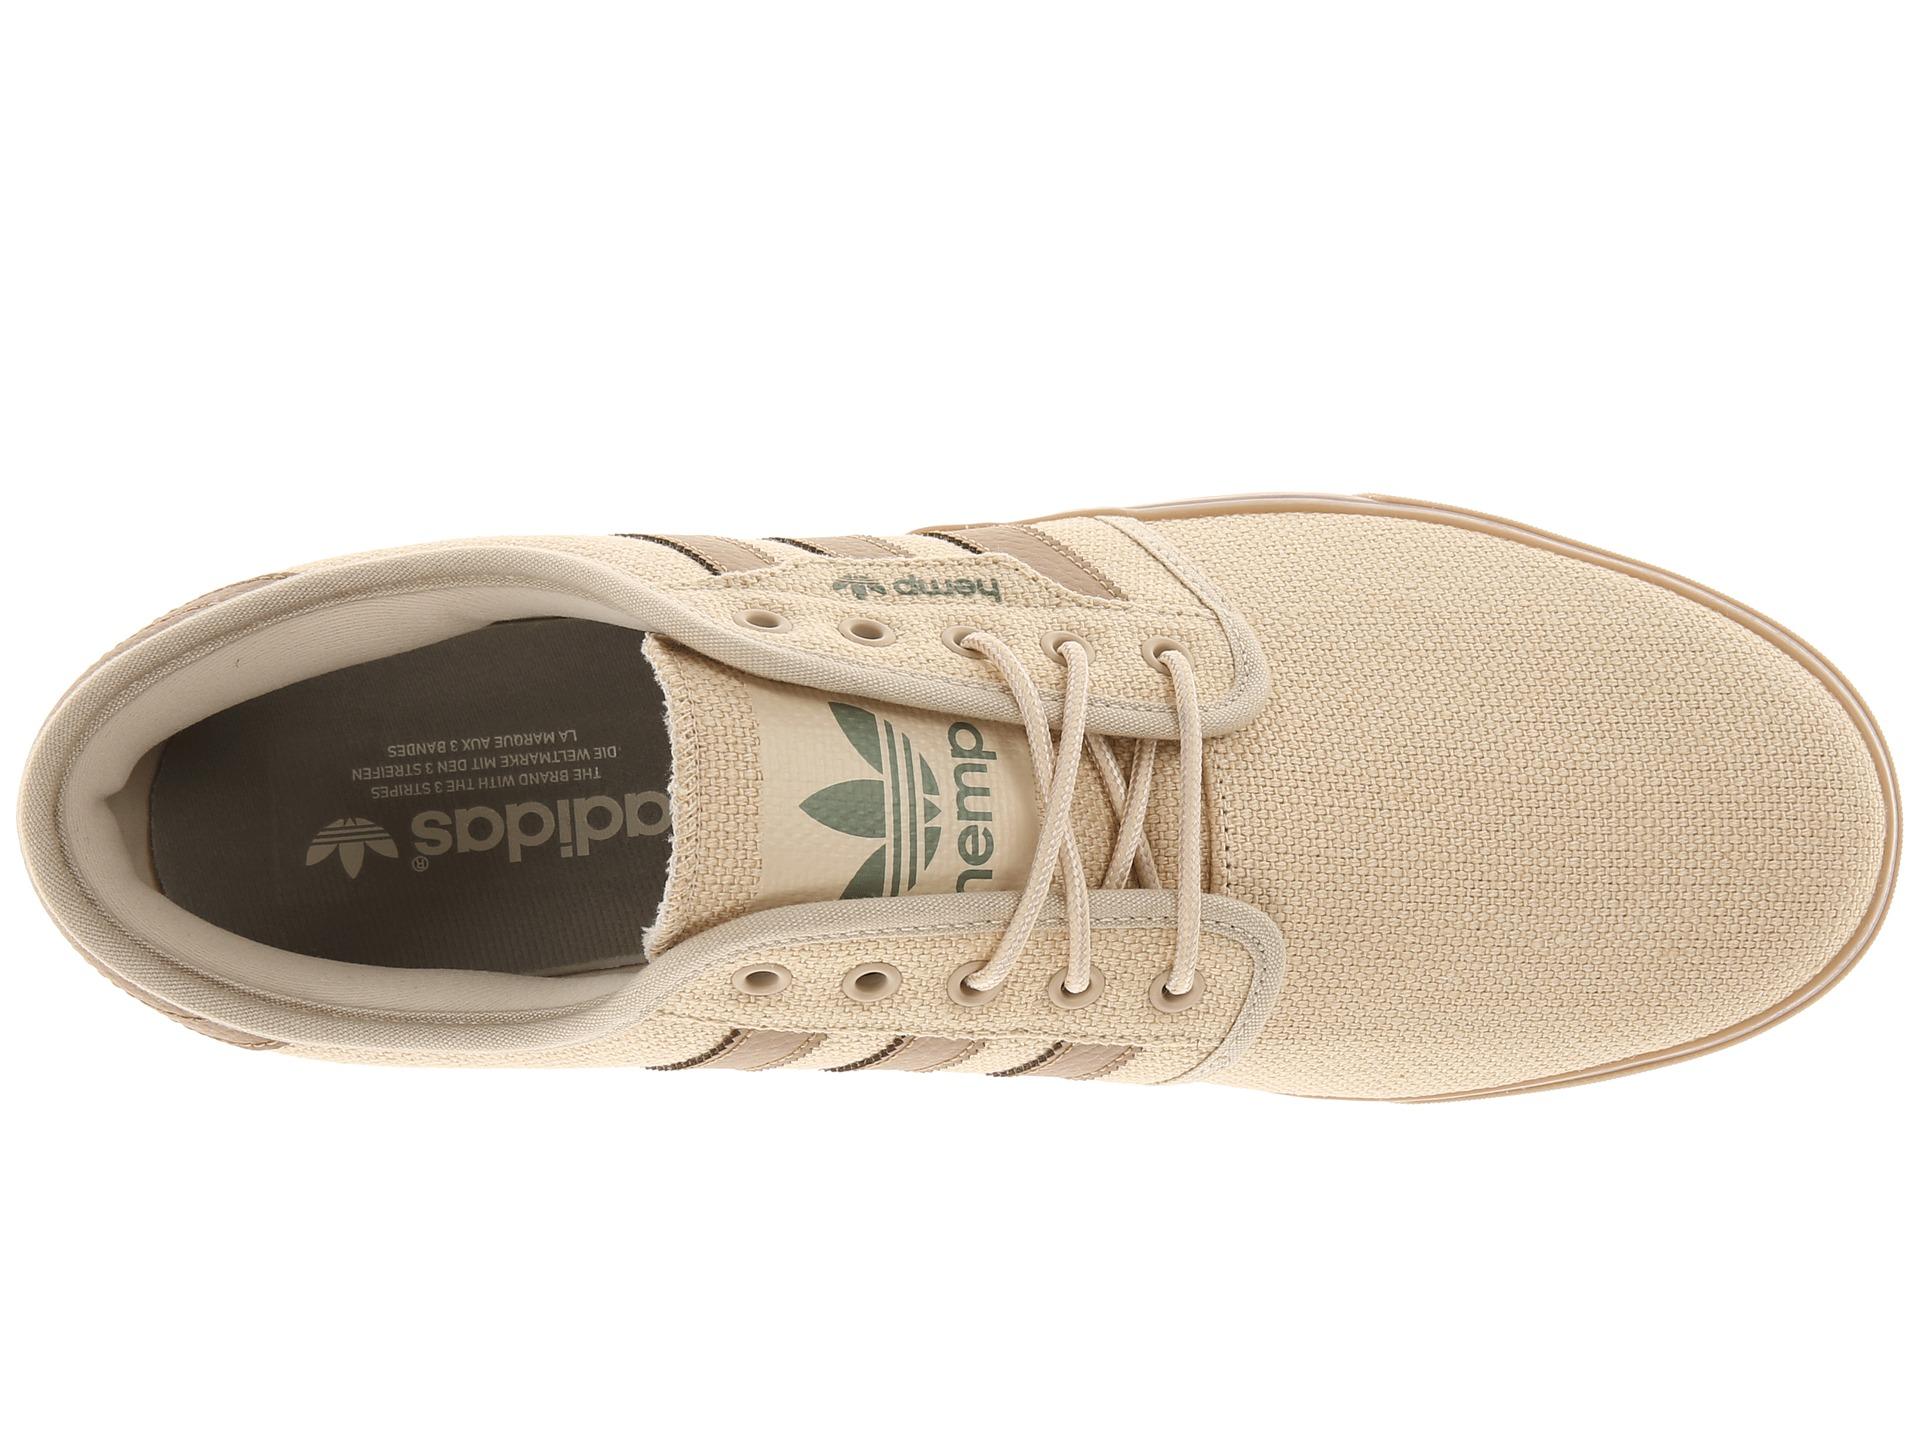 Adidas Skateboarding Seeley Hemp, Shoes